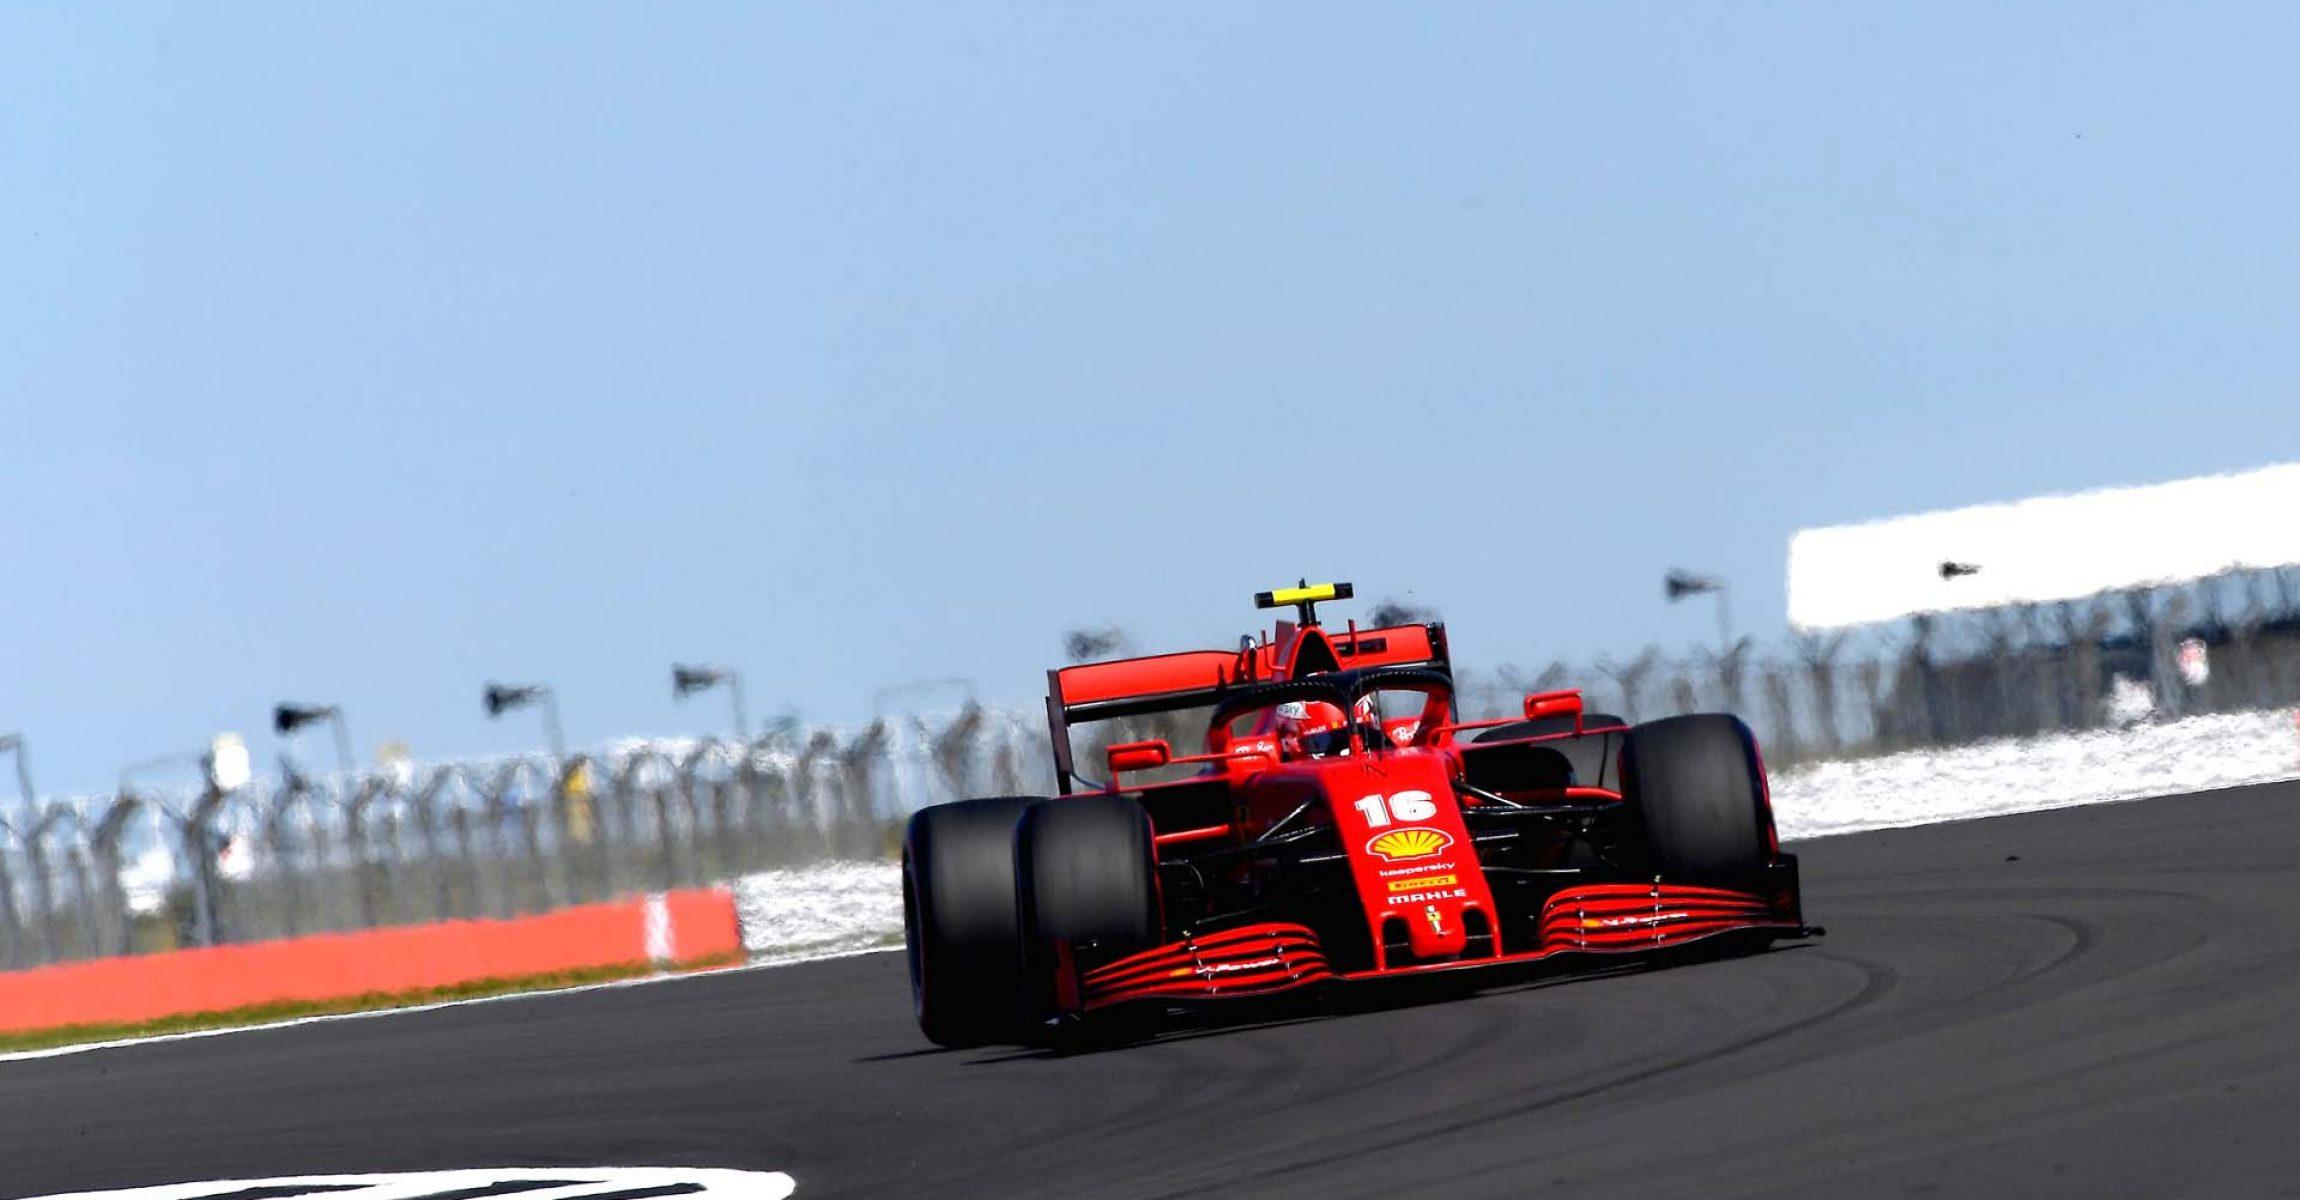 GP 70MO ANNIVERSARIO  F1/2020 -  VENERDÌ 07/08/2020    credit: @Scuderia Ferrari Press Office Charles Leclerc